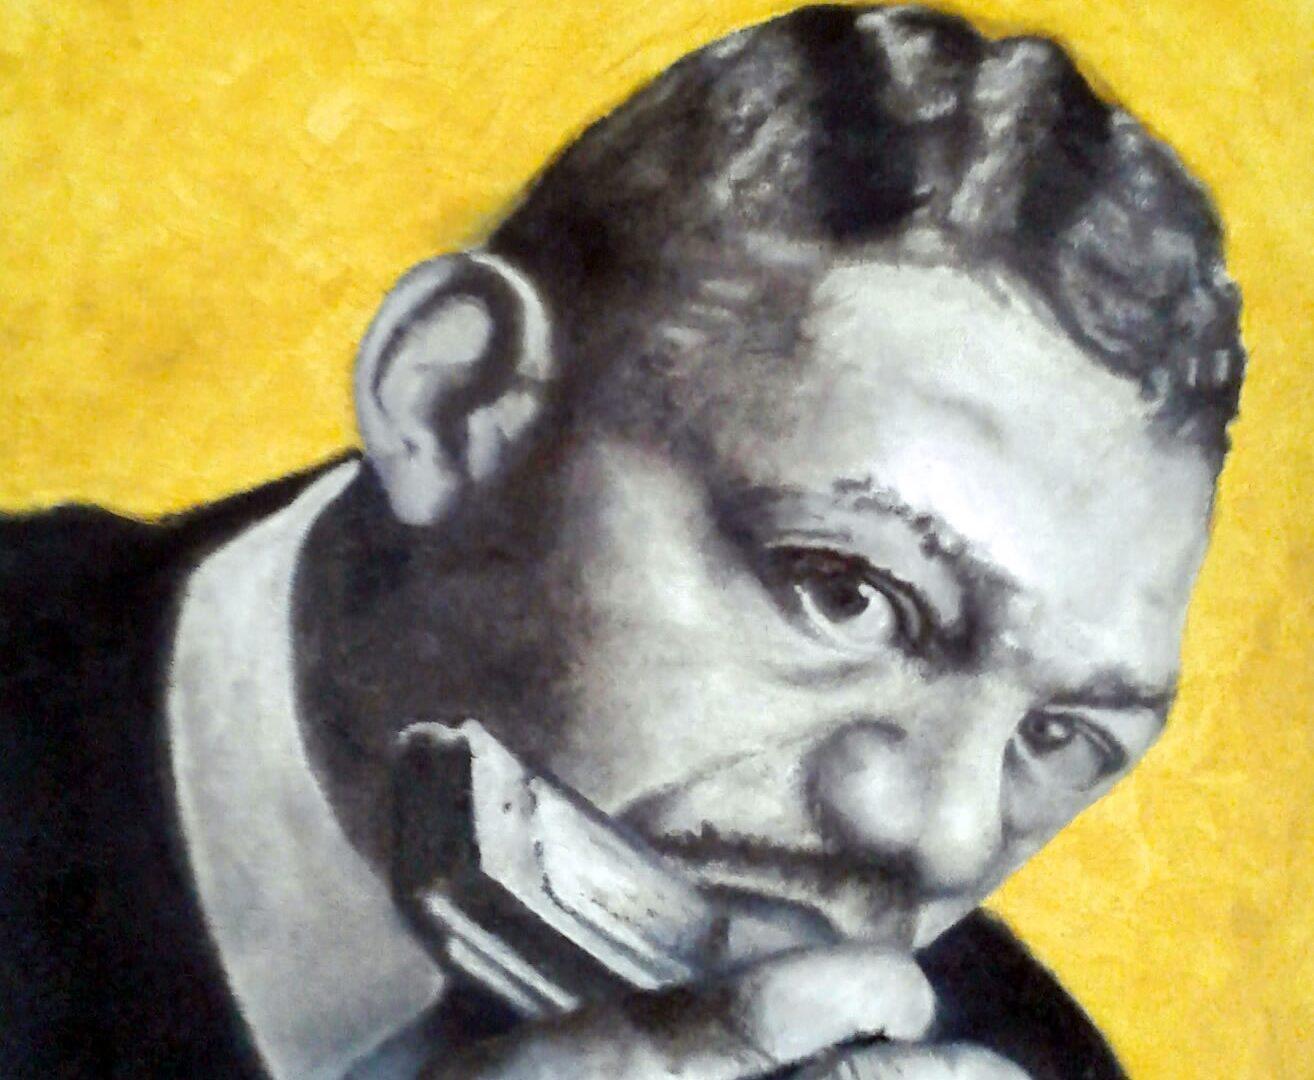 Litlle Walter Gaitista pintura oleo sobre tela Angela Lemos